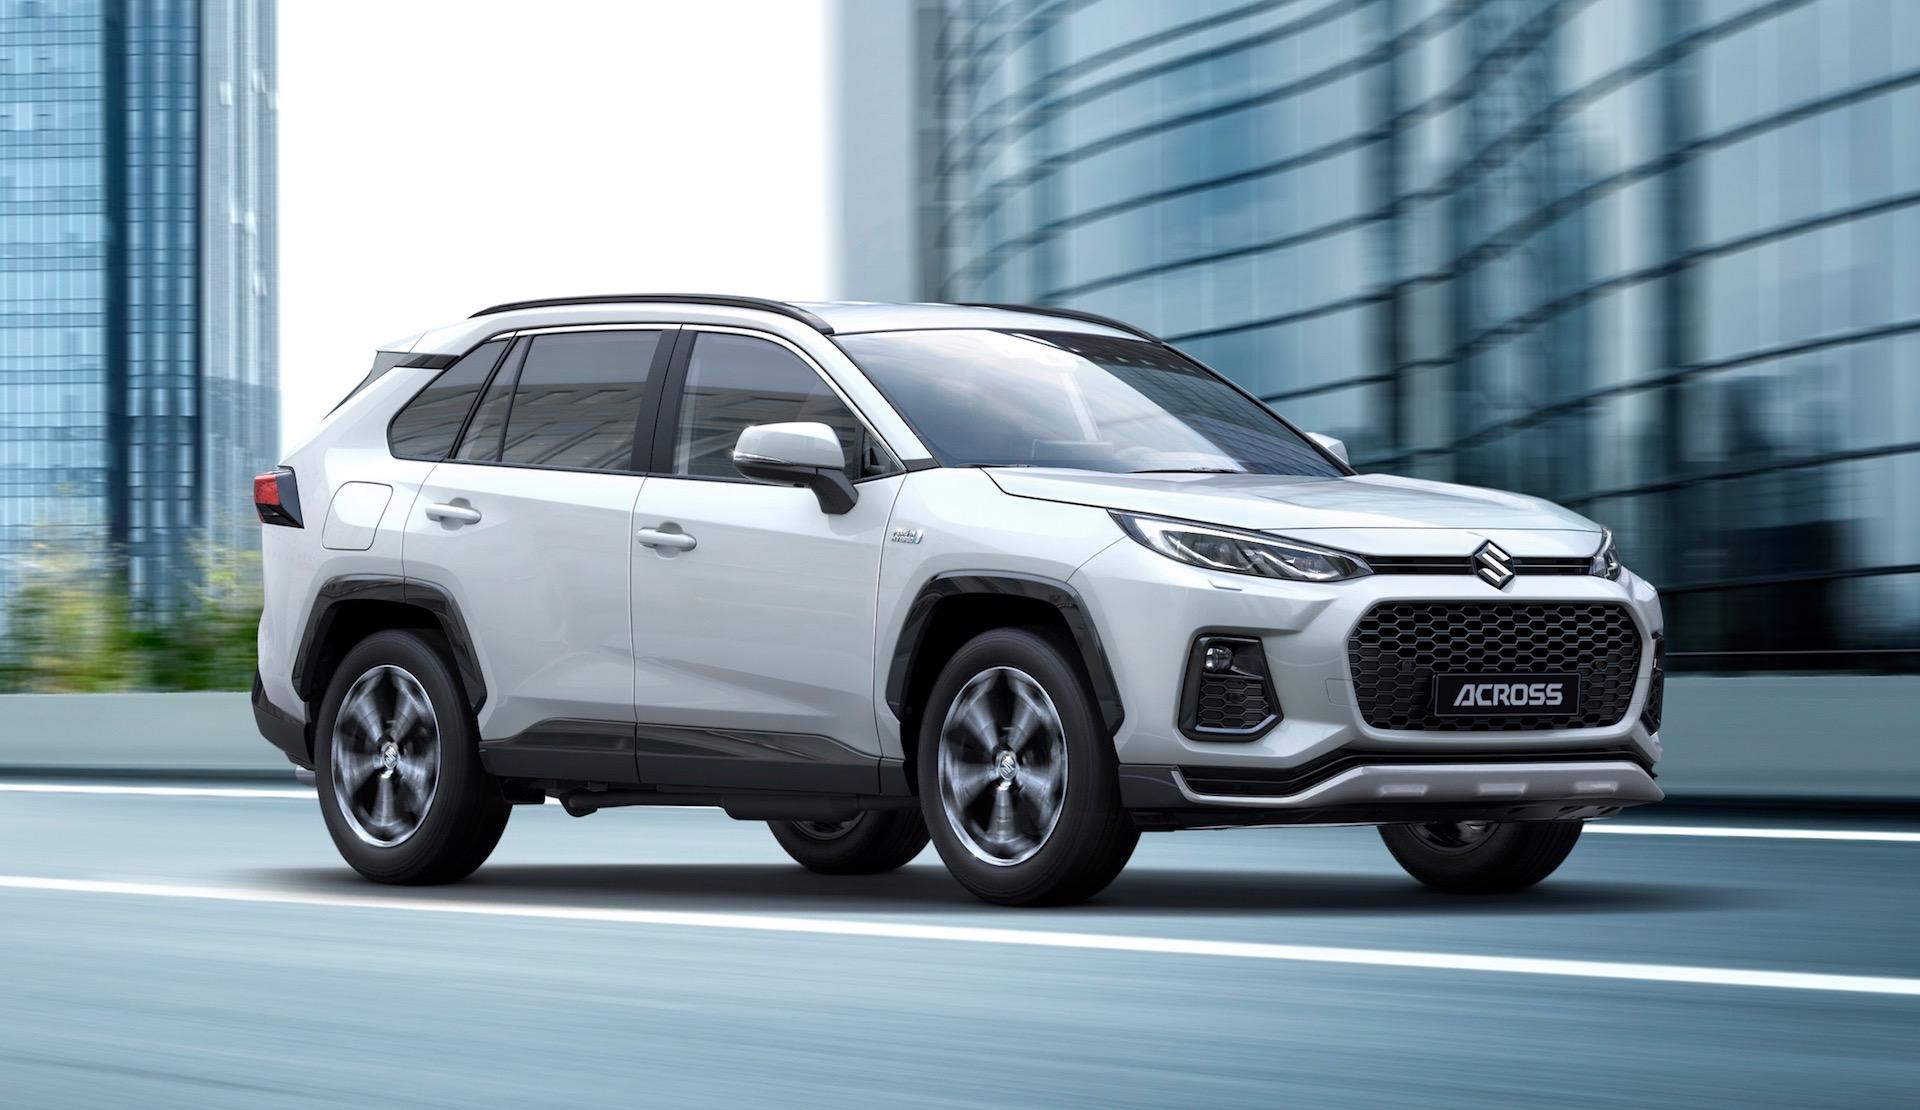 Suzuki Across SUV revealed, based on Toyota RAV4